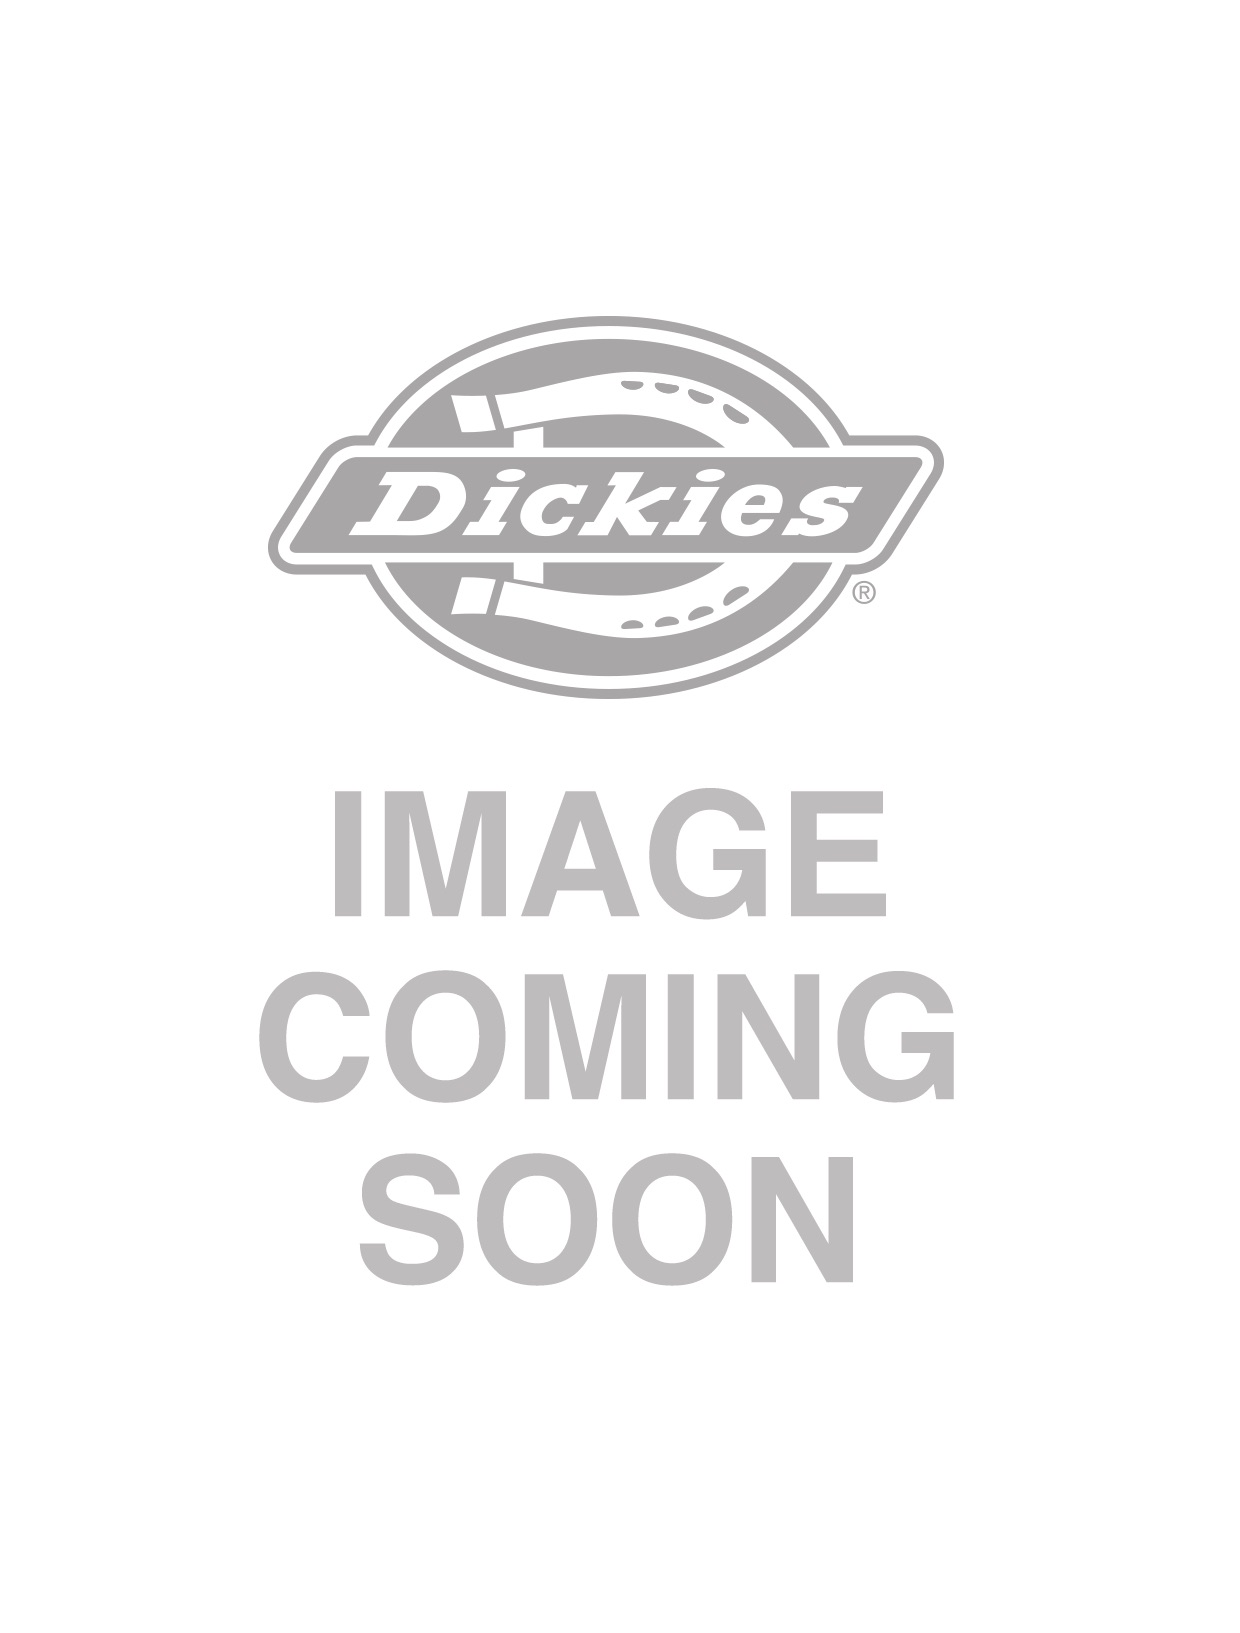 Dickies Hague Slim Straight Short